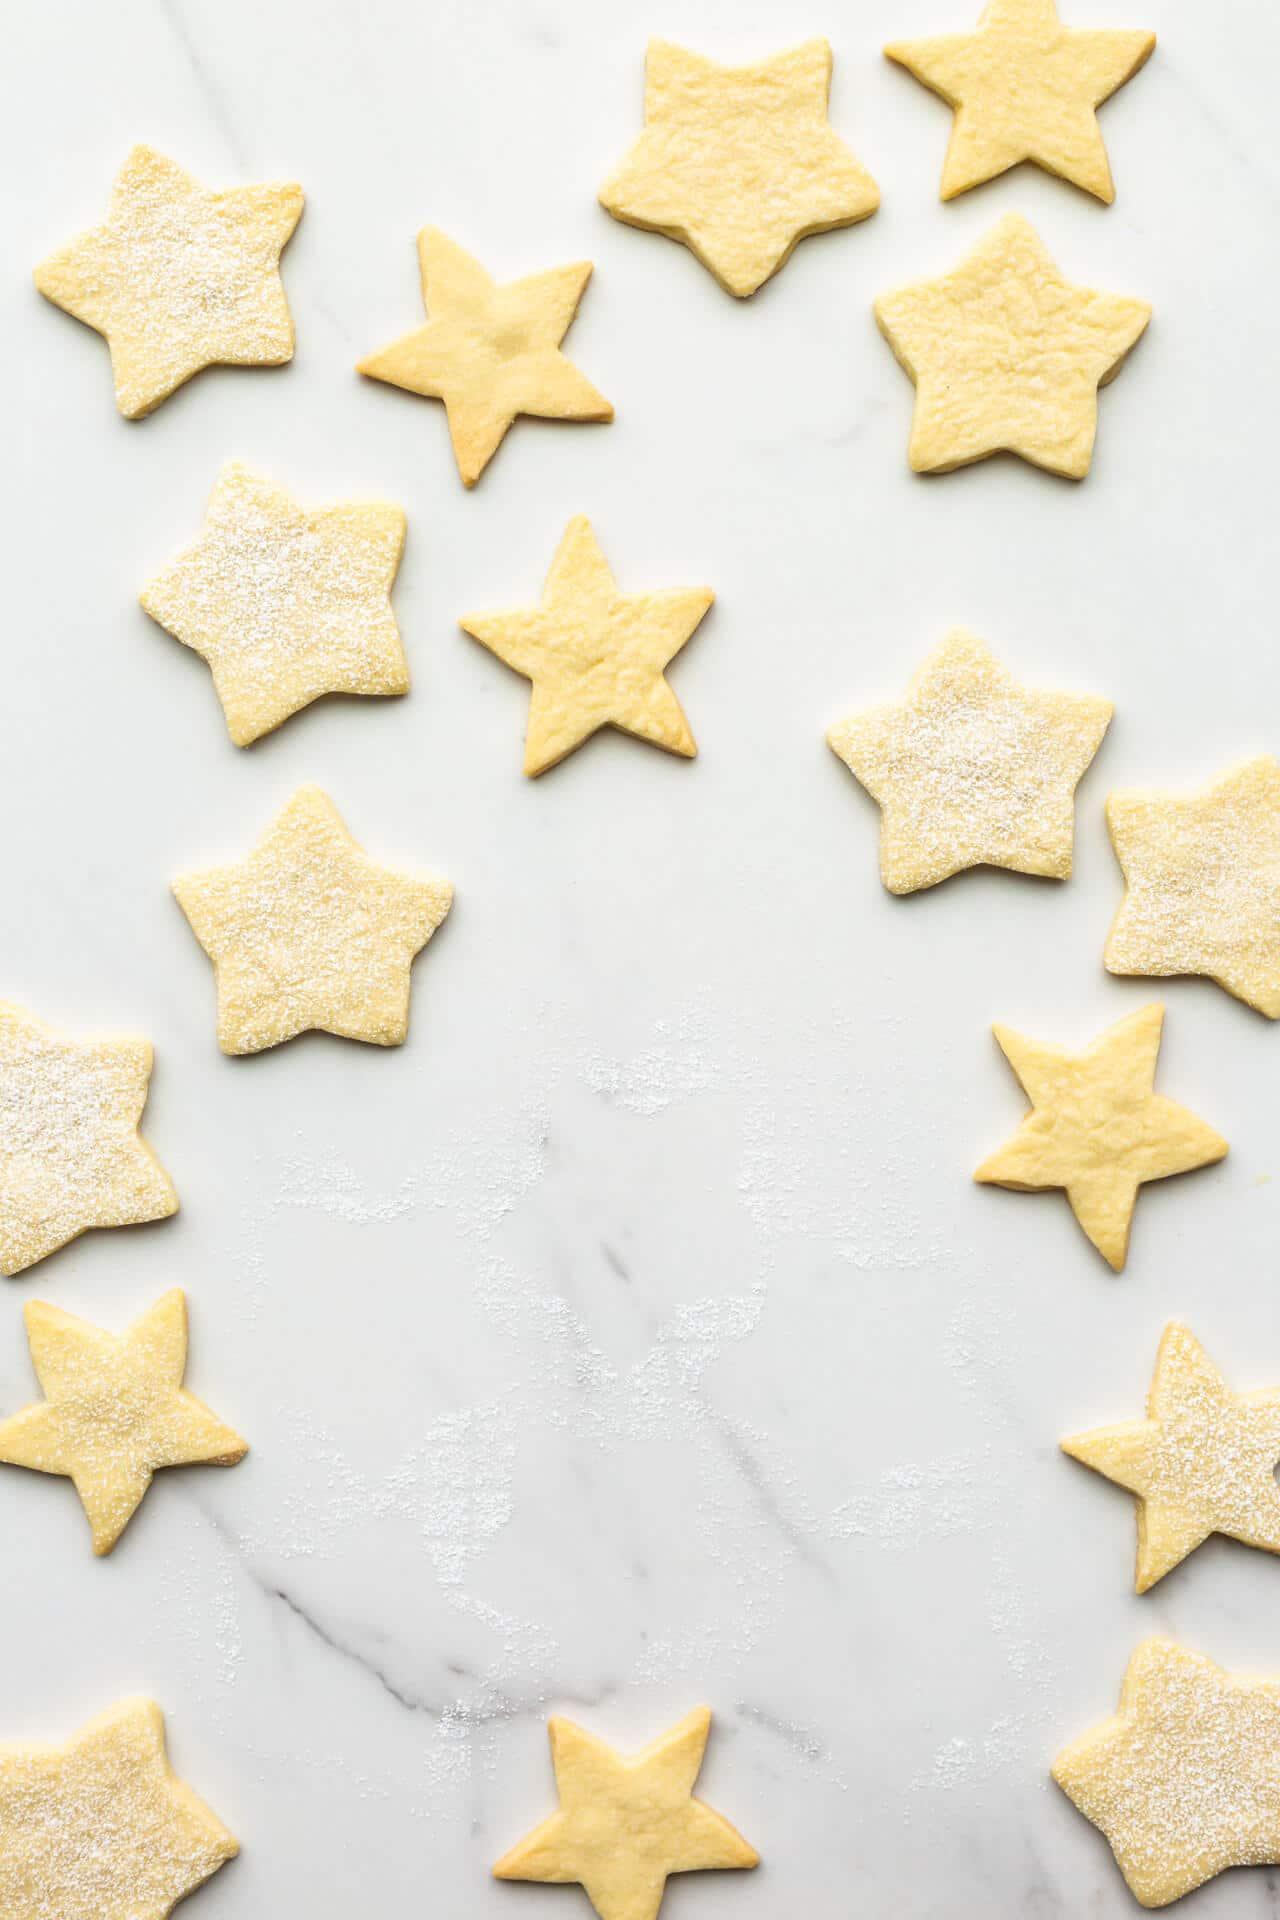 Shortbread stars on marble surface.